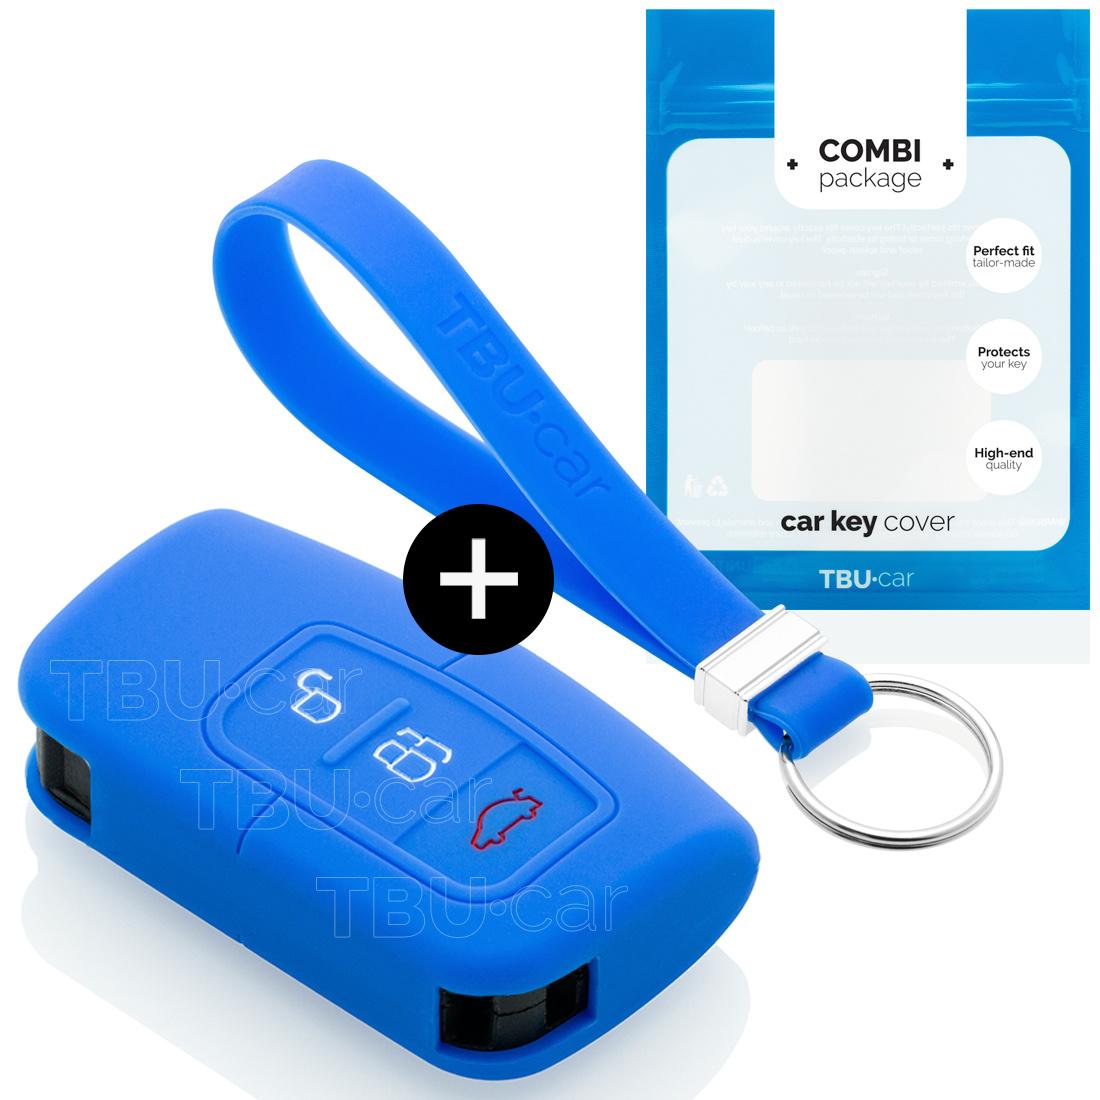 Ford Capa Silicone Chave do carro - Capa protetora - Tampa remota FOB - Azul